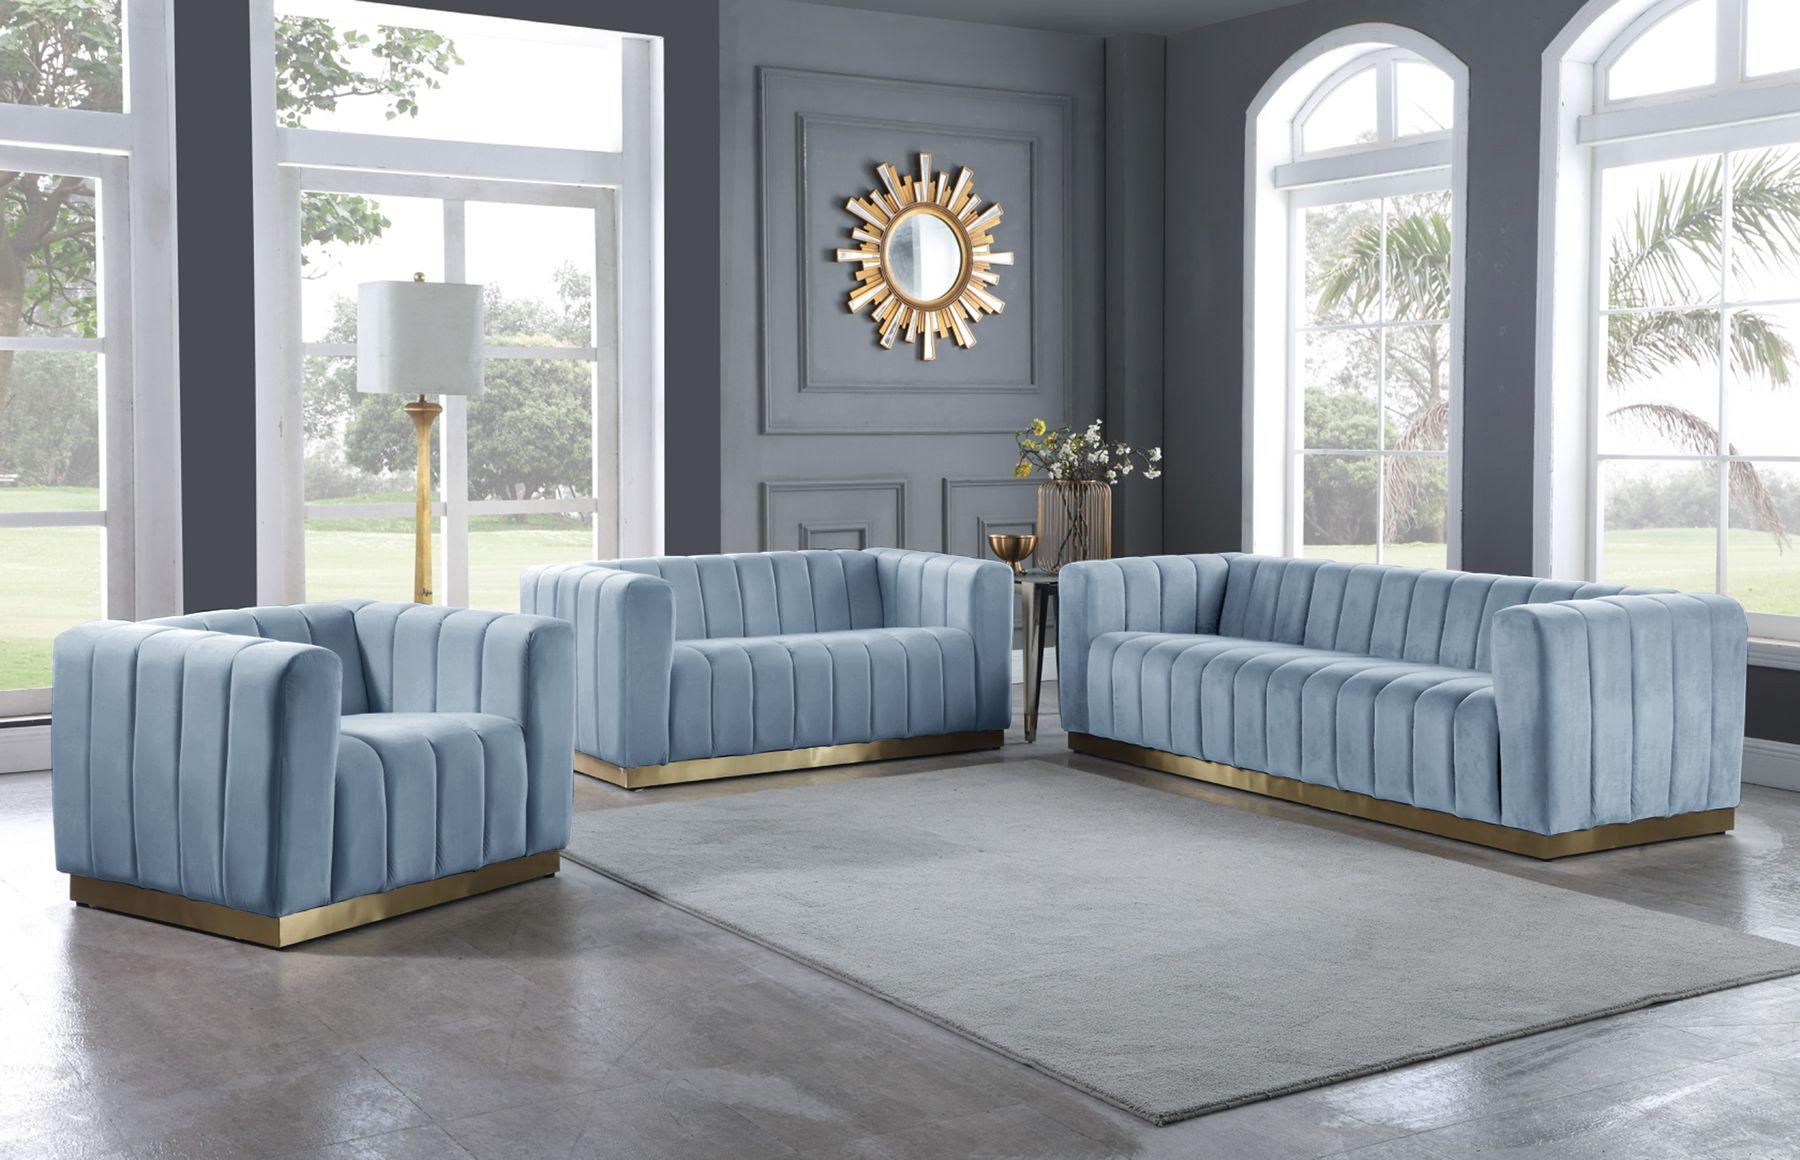 Marlon Blue Sofa 603 Meridian Furniture Fabric Sofas Blue Velvet Sofa Living Room Velvet Sofa Living Room Meridian Furniture